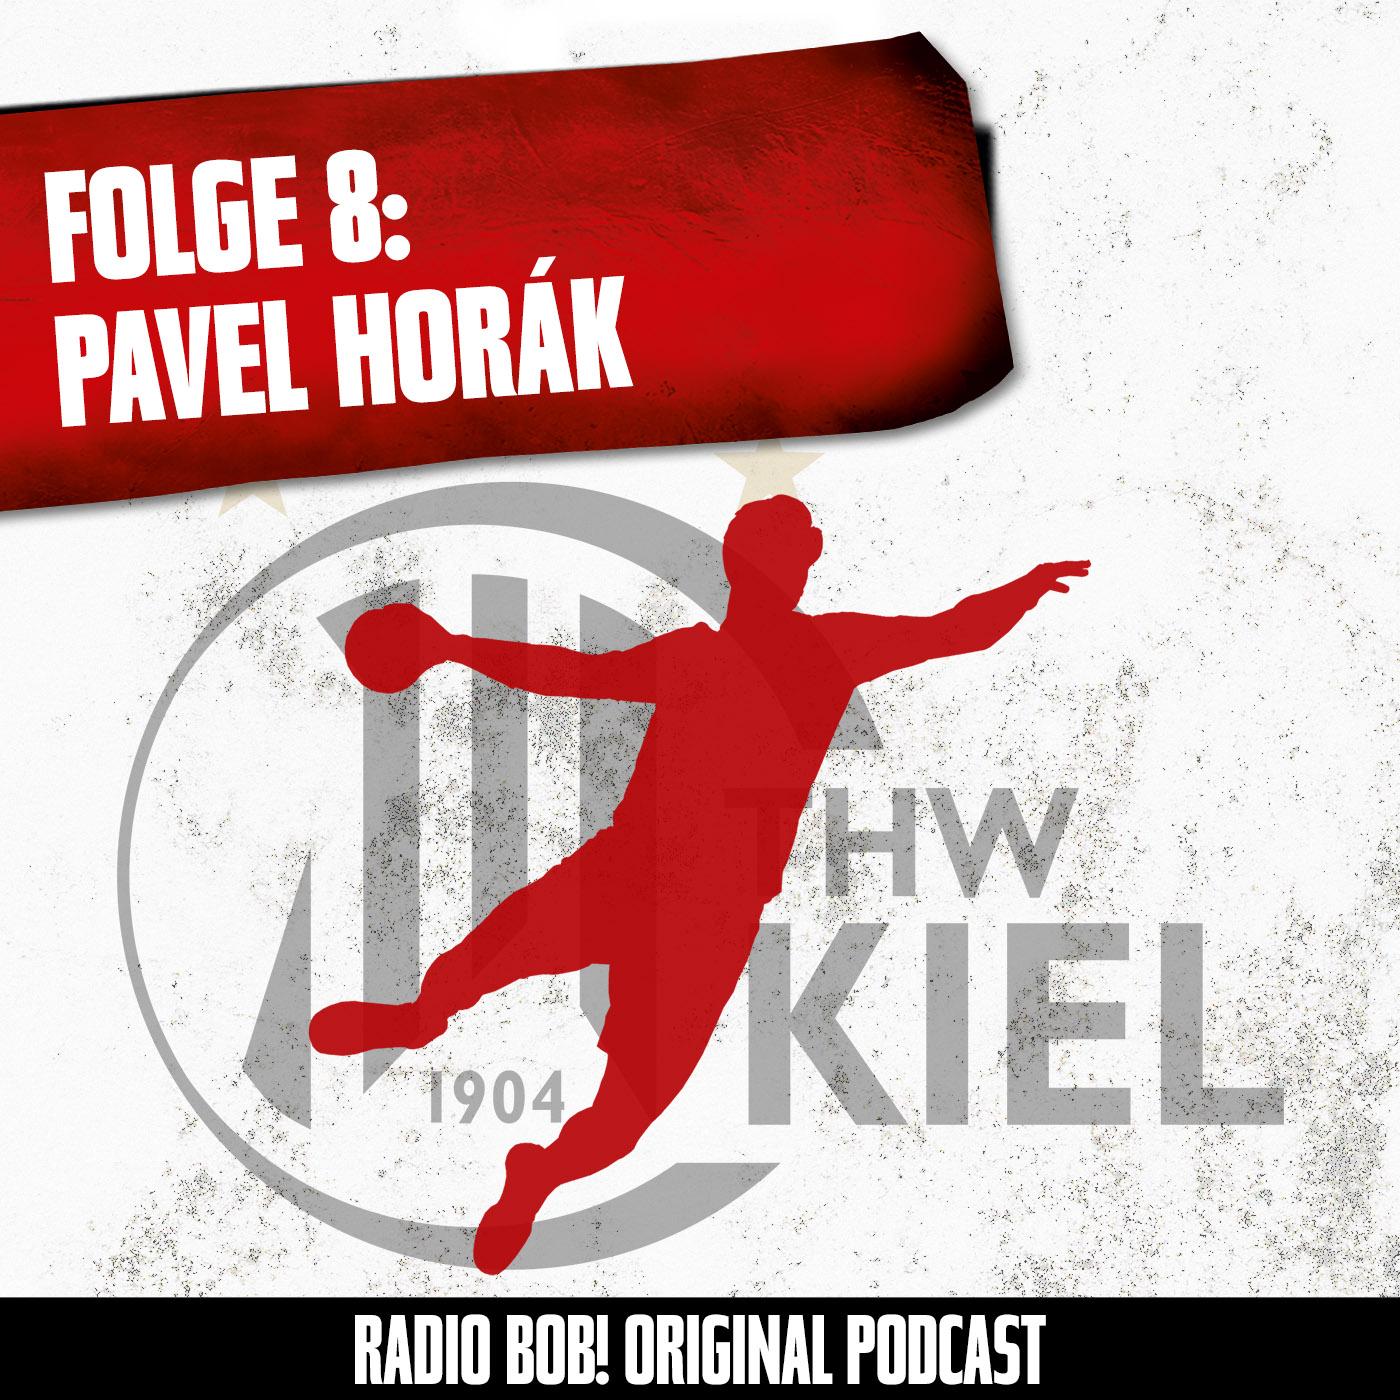 #8: Pavel Horák